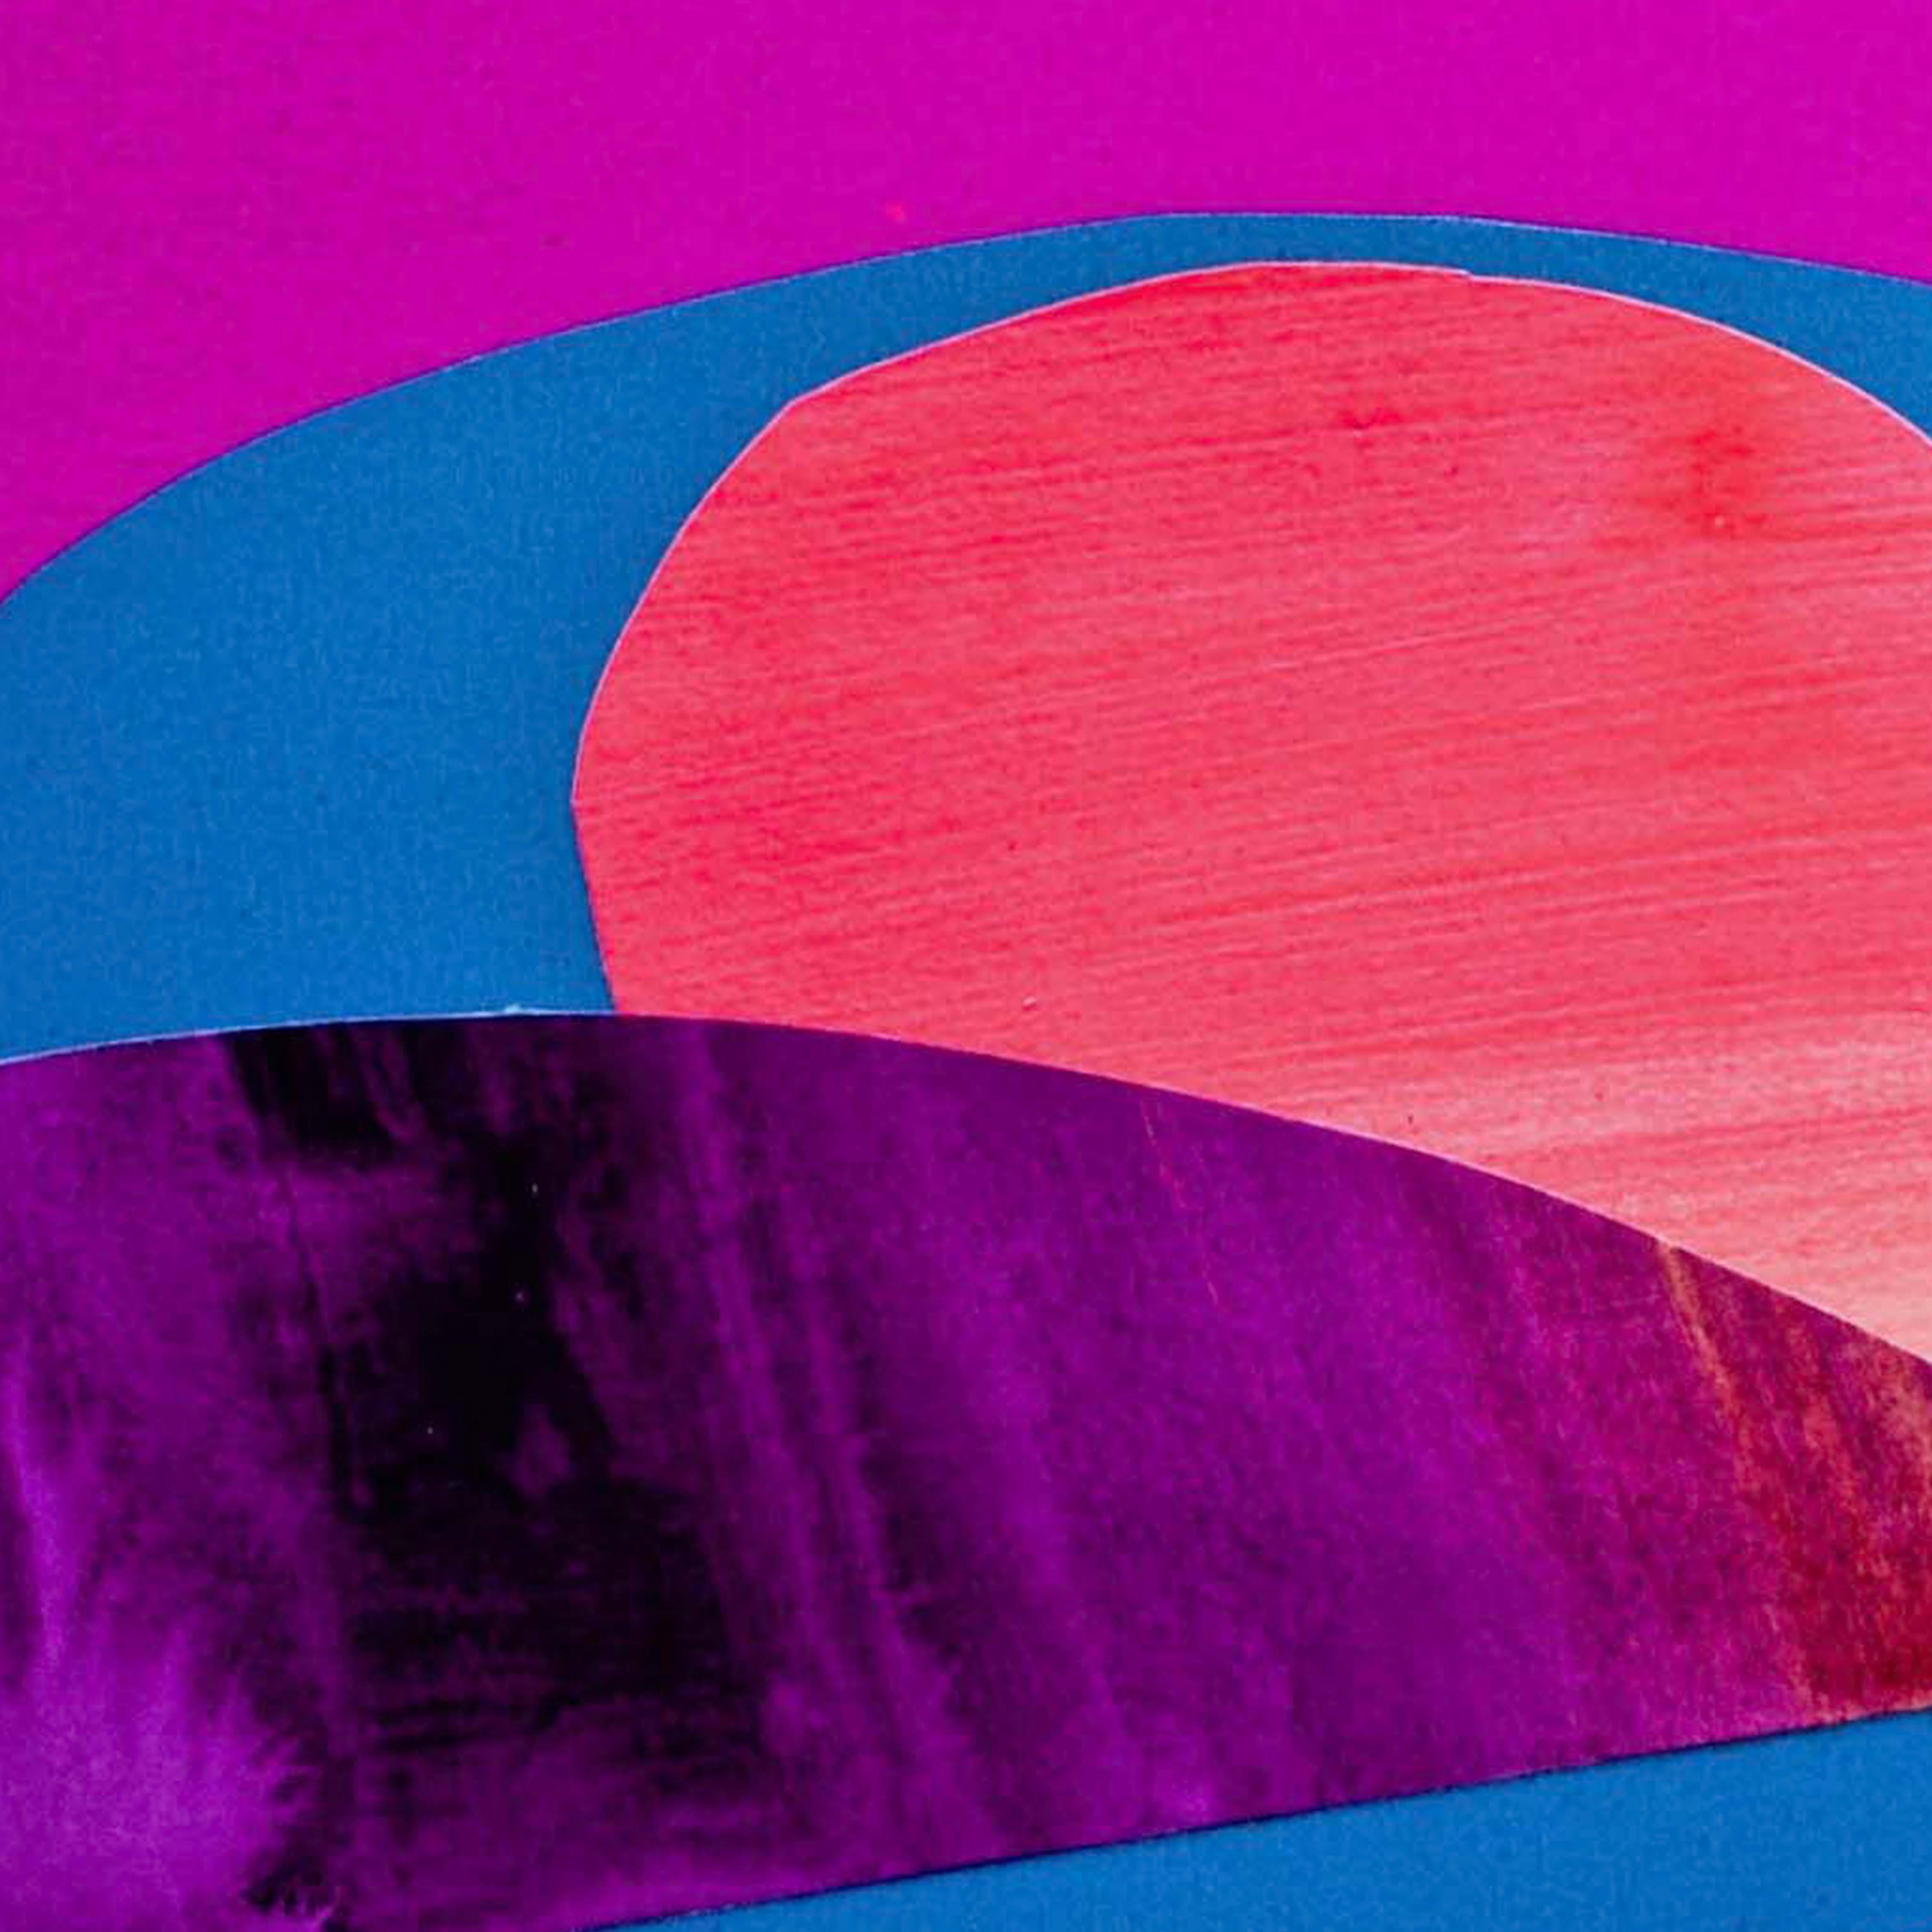 contemporary art, colorful art, contemporary, nature art work, tree art, moody painting, natural art, art, colorful art, geometric rainbow art, modern art, colorful abstract art, rent art, modern oil painting, warm color tones, bright pantone, fun art for office, colorful contemporary painting, yellow red blue painting, vibrant contrasting art, vibrant color palette, abstract colorful, art work for home, painting for apartment, hand painted artwork, unique home painting, geometric rainbow art, modern art, colorful abstract art, rent art, modern oil painting, warm color tones, bright pantone, fun art for office, colorful contemporary painting, yellow red blue painting, vibrant contrasting art, vibrant color palette, abstract colorful, art work for home, painting for apartment, hand painted artwork, unique home painting, black and white art, black white yellow art, oil canvas painting, modern art inspiration, sculpture for home, colorful wall art, woman artwork, semi realistic painting